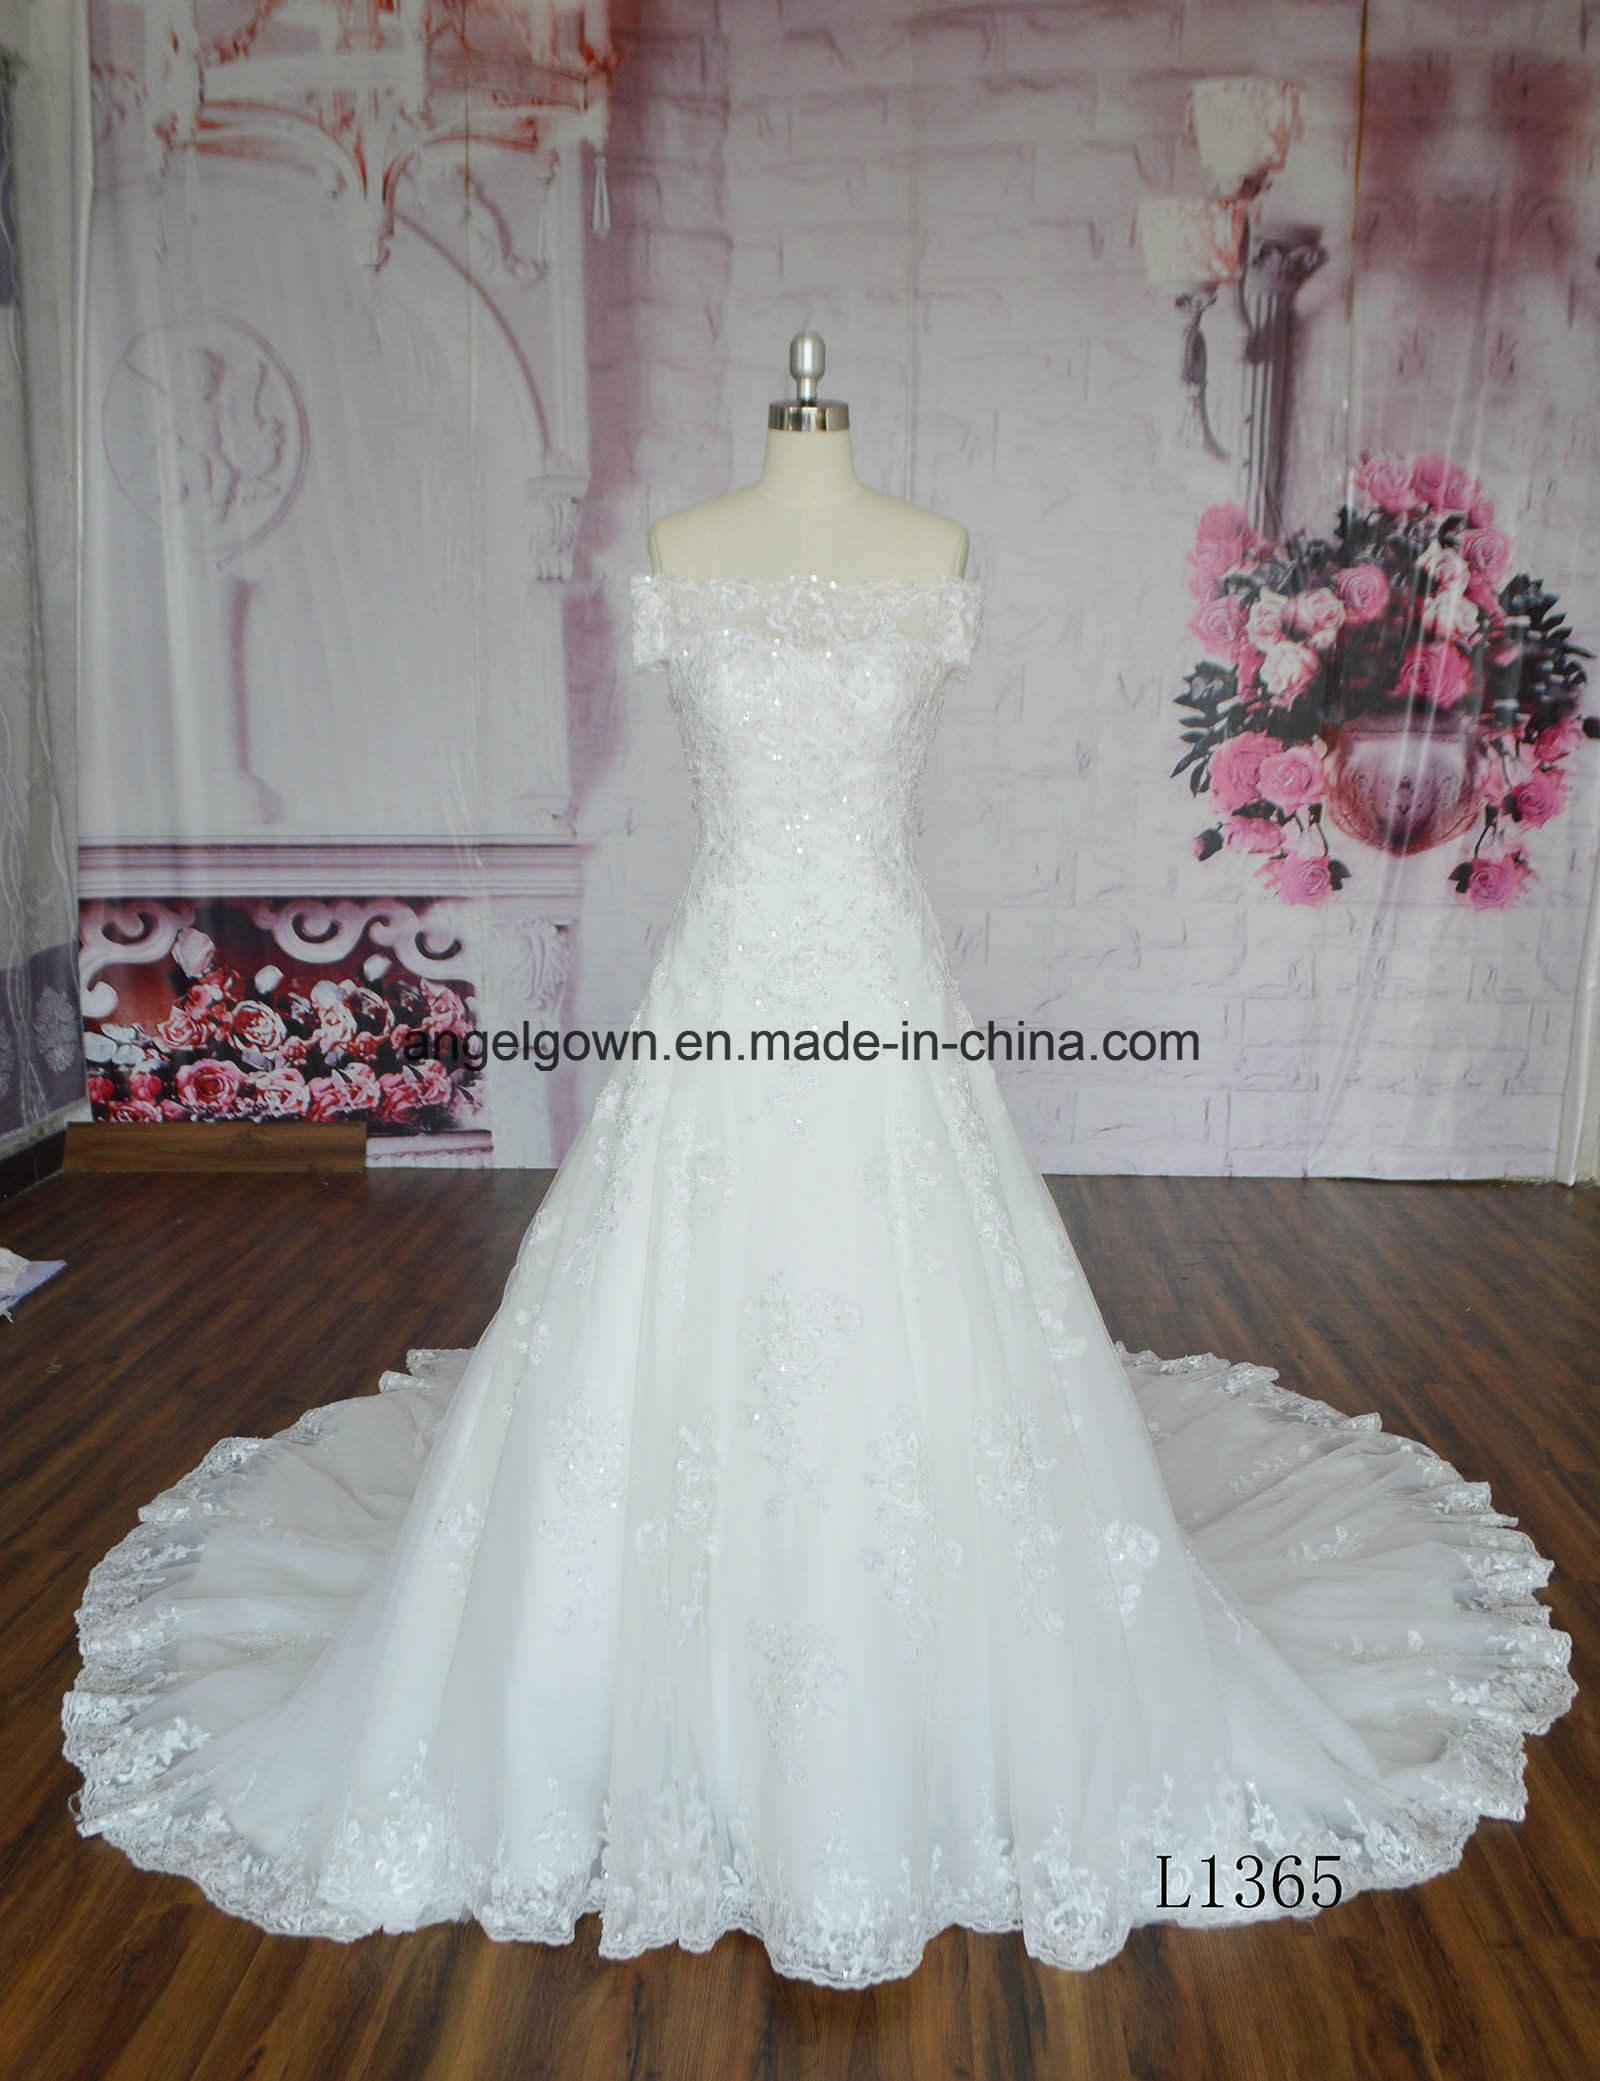 Long Train off Shoulder Lace Applique Abito Da Matrimonio Wedding Dress